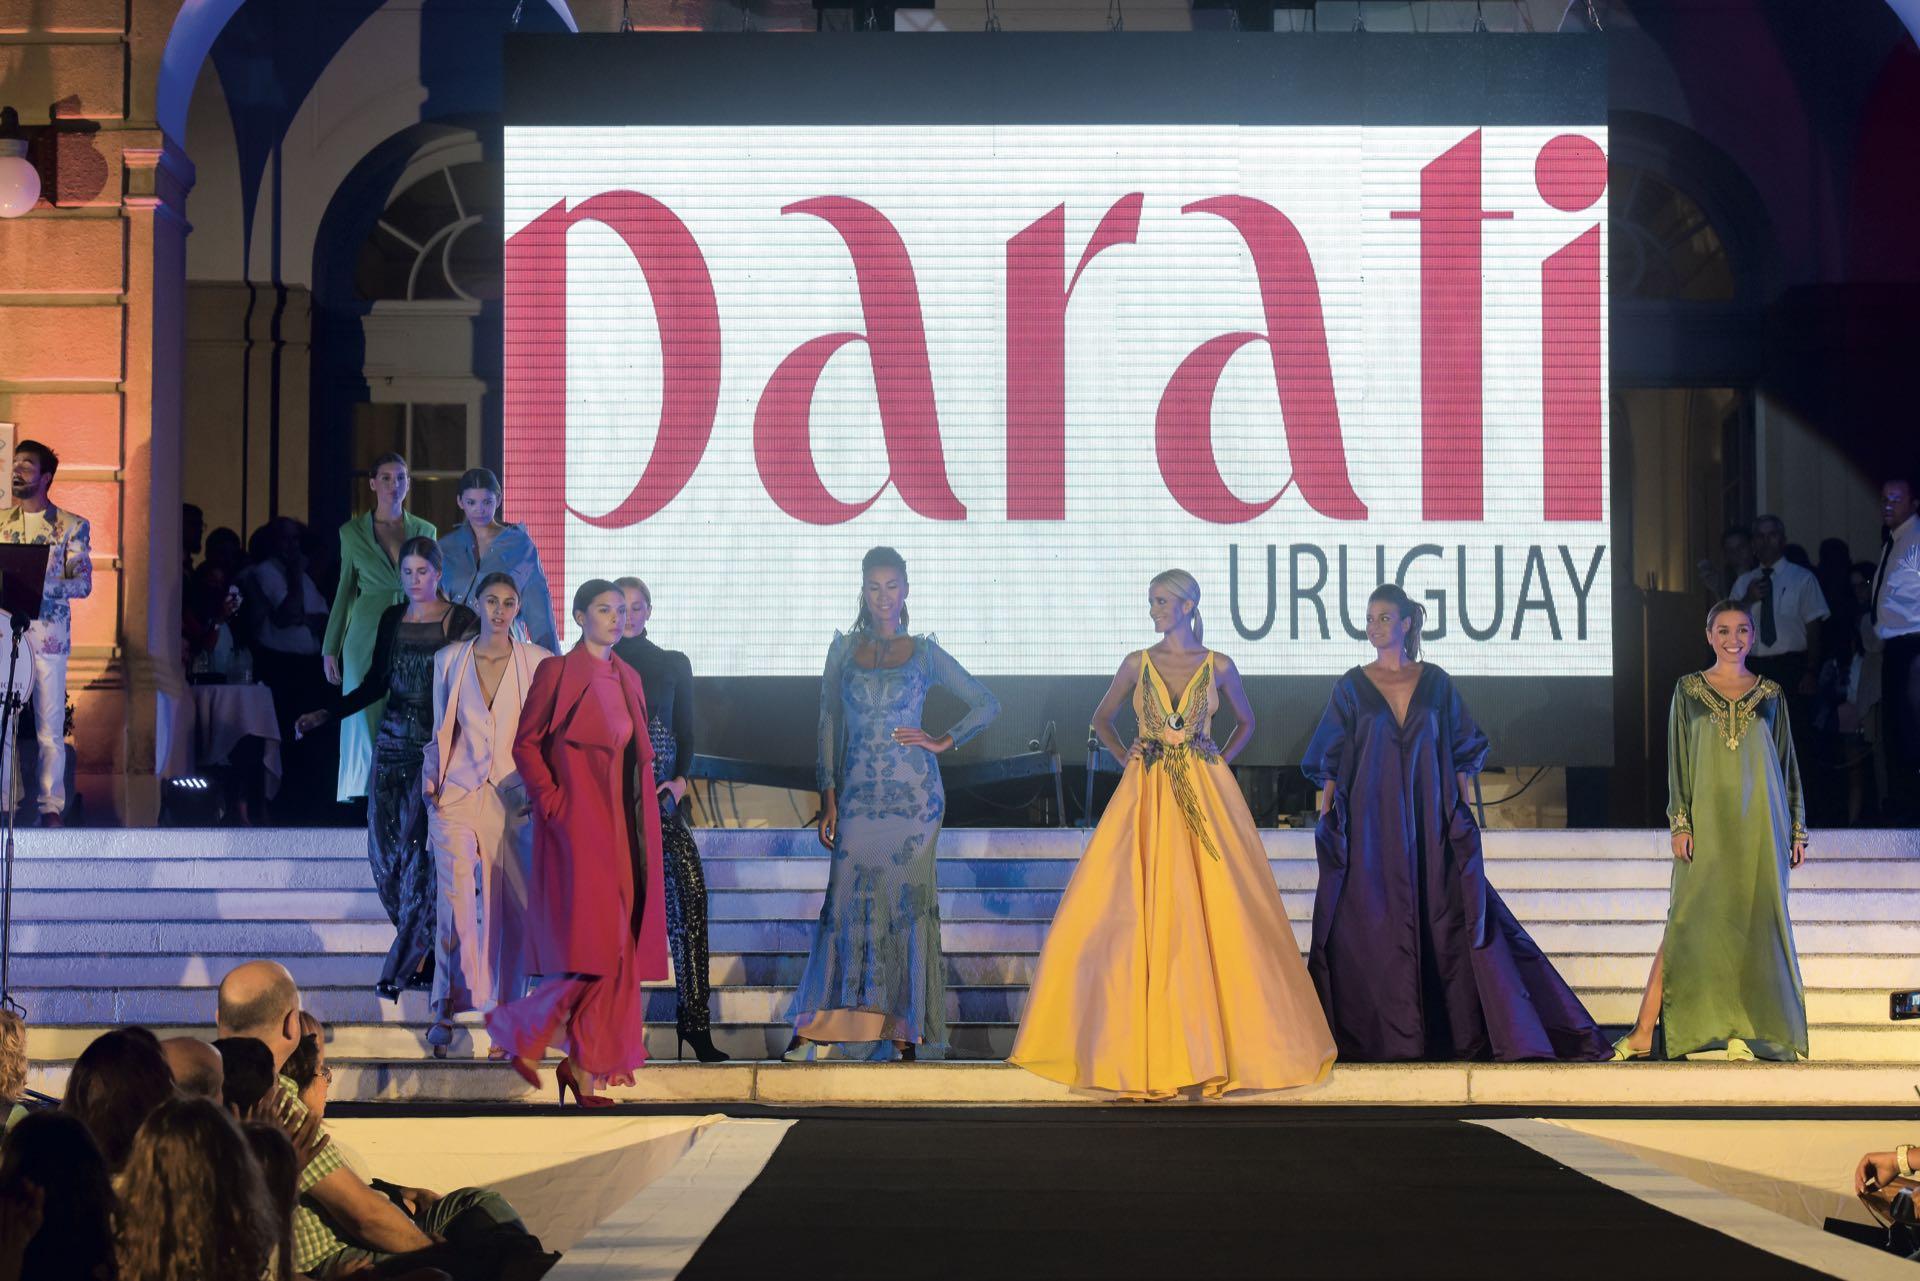 #PARA TI - DESFILE PARATI URUGUAY19 - moda - MC - 20180302